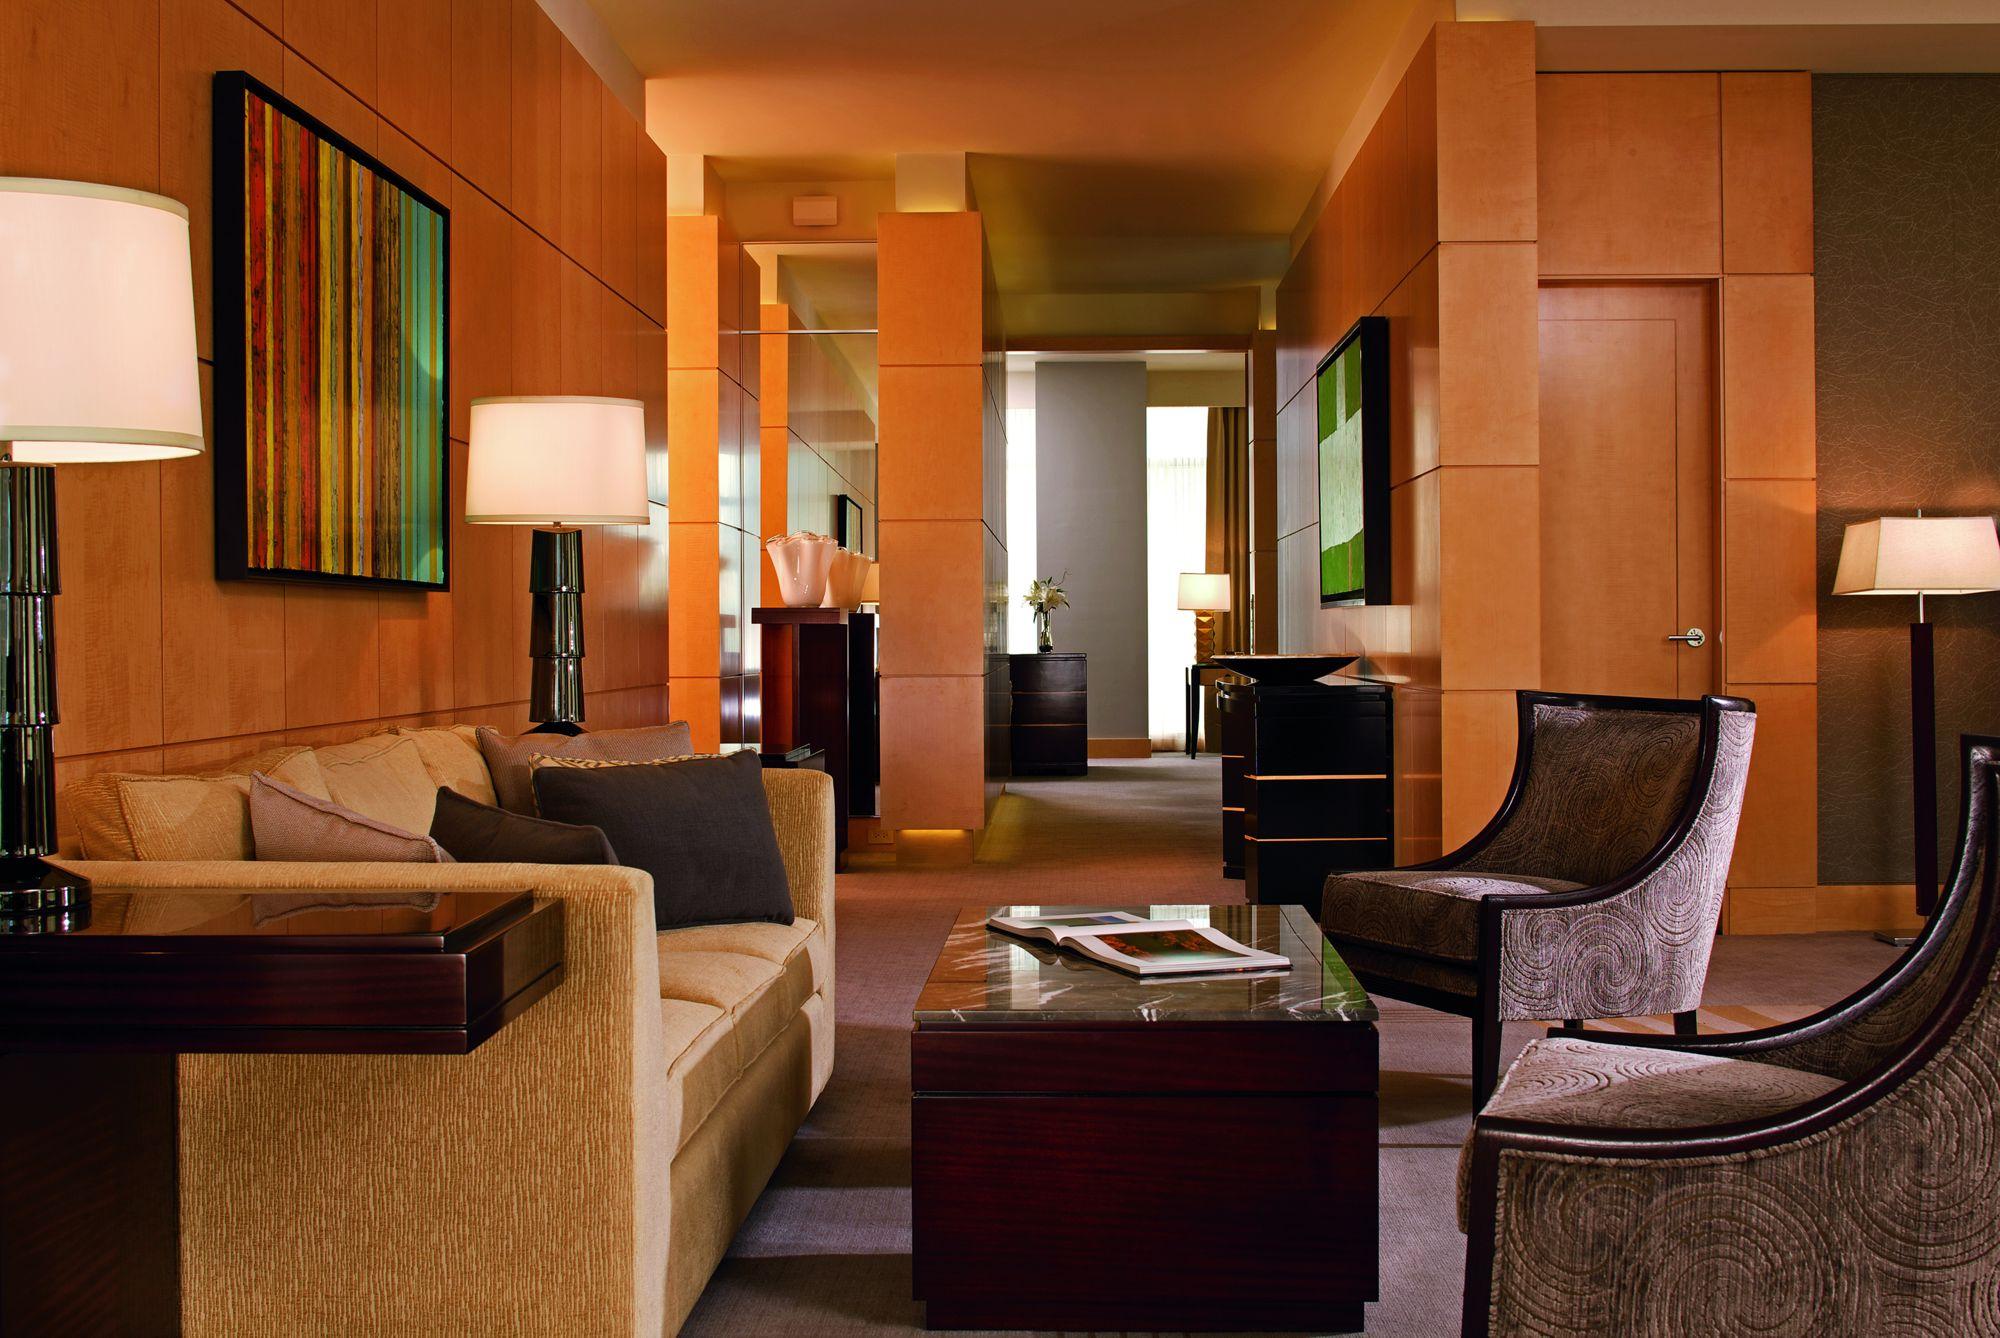 The Ritz-Carlton, Charlotte image 7